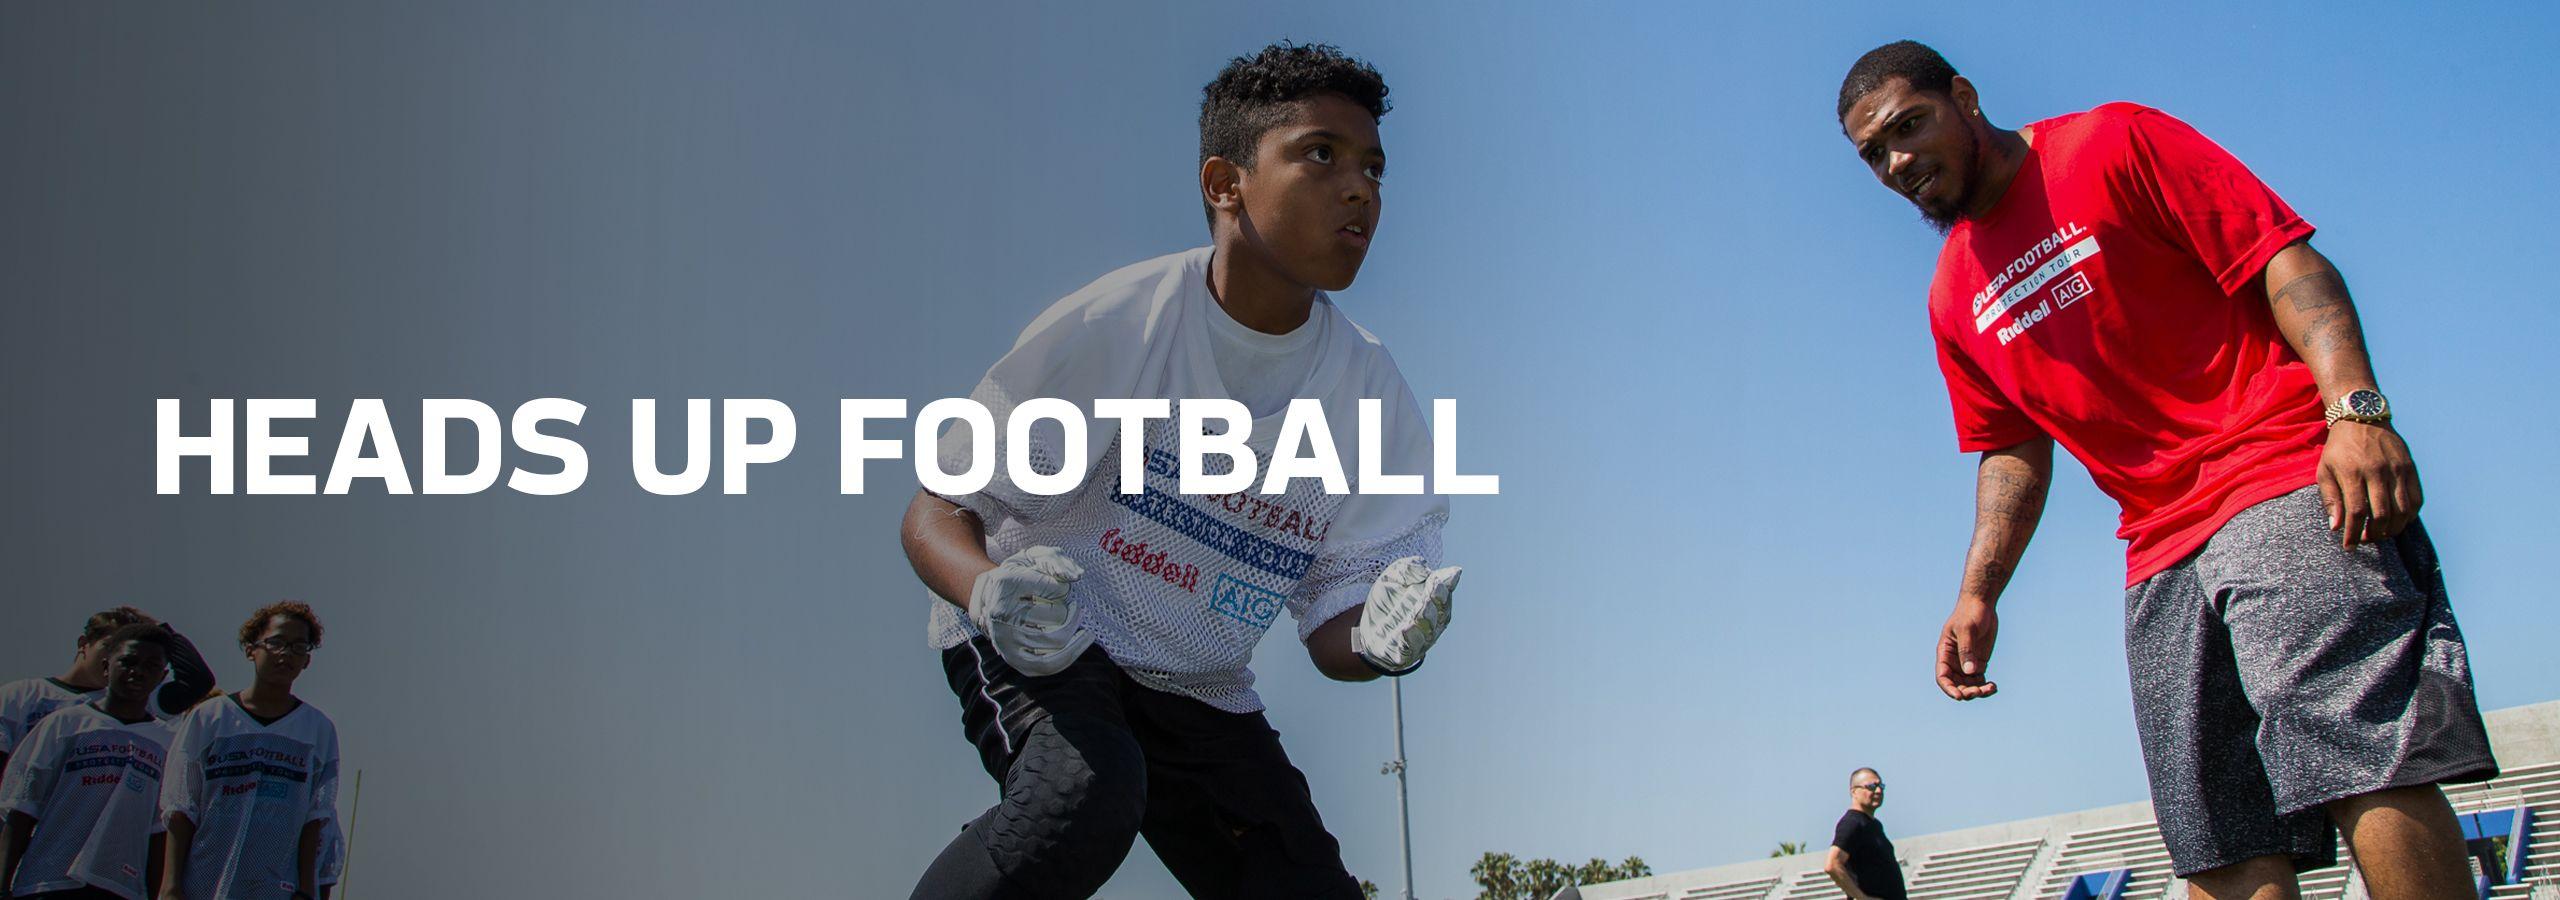 200127_Site_Header_Heads_Up_Football